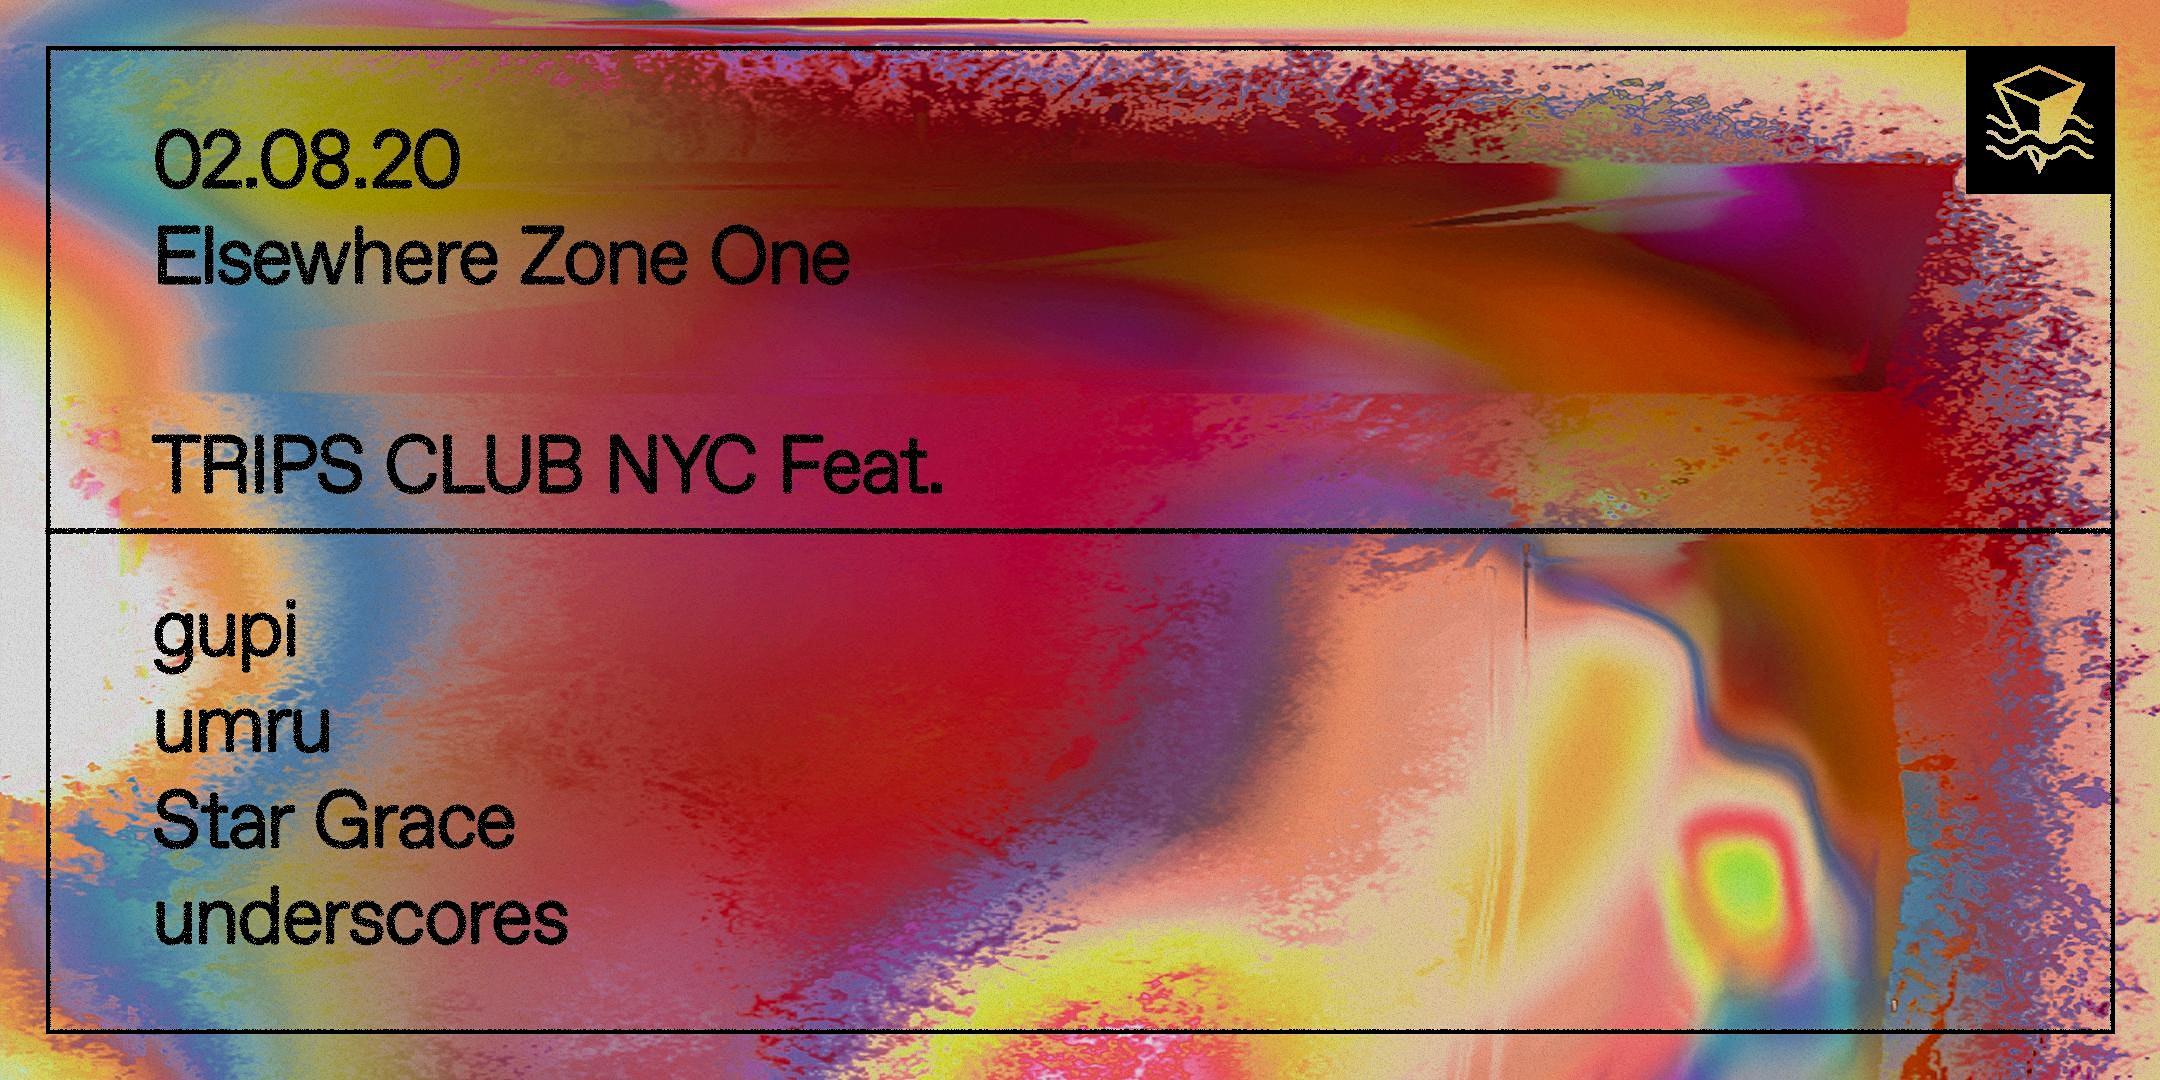 TRIPS CLUB NYC Feat. gupi, umru, Star Grace & underscores